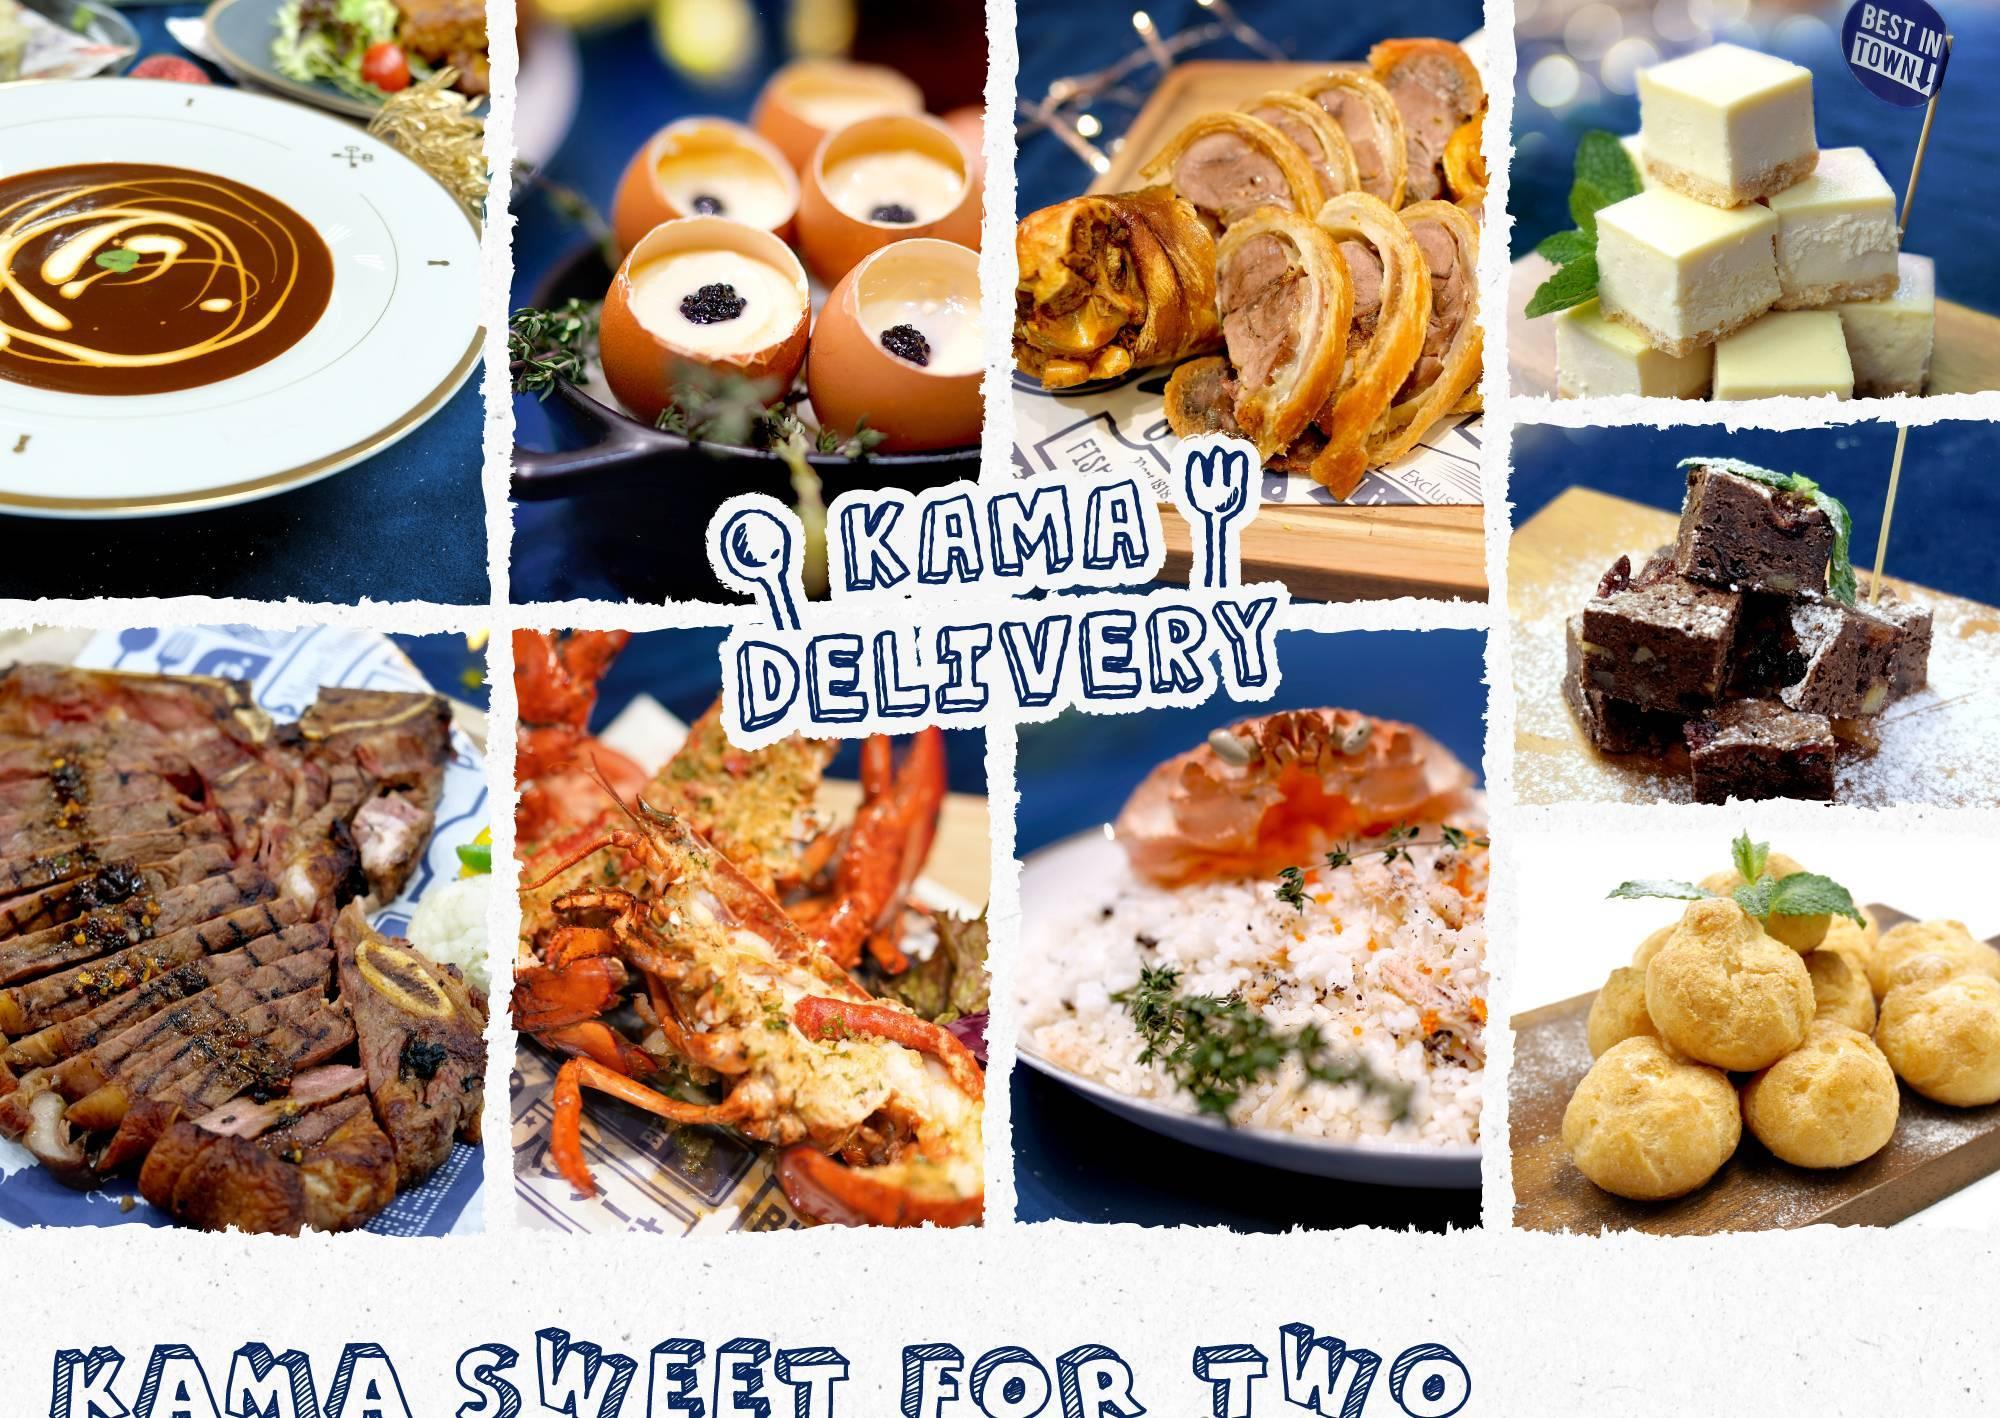 Kama Sweet for TWO 套餐食物份量適合2人小型到會享用,此外賣適合慶祝生日、拍拖、結婚週年紀念日、Staycation、二人世界等場合享用。